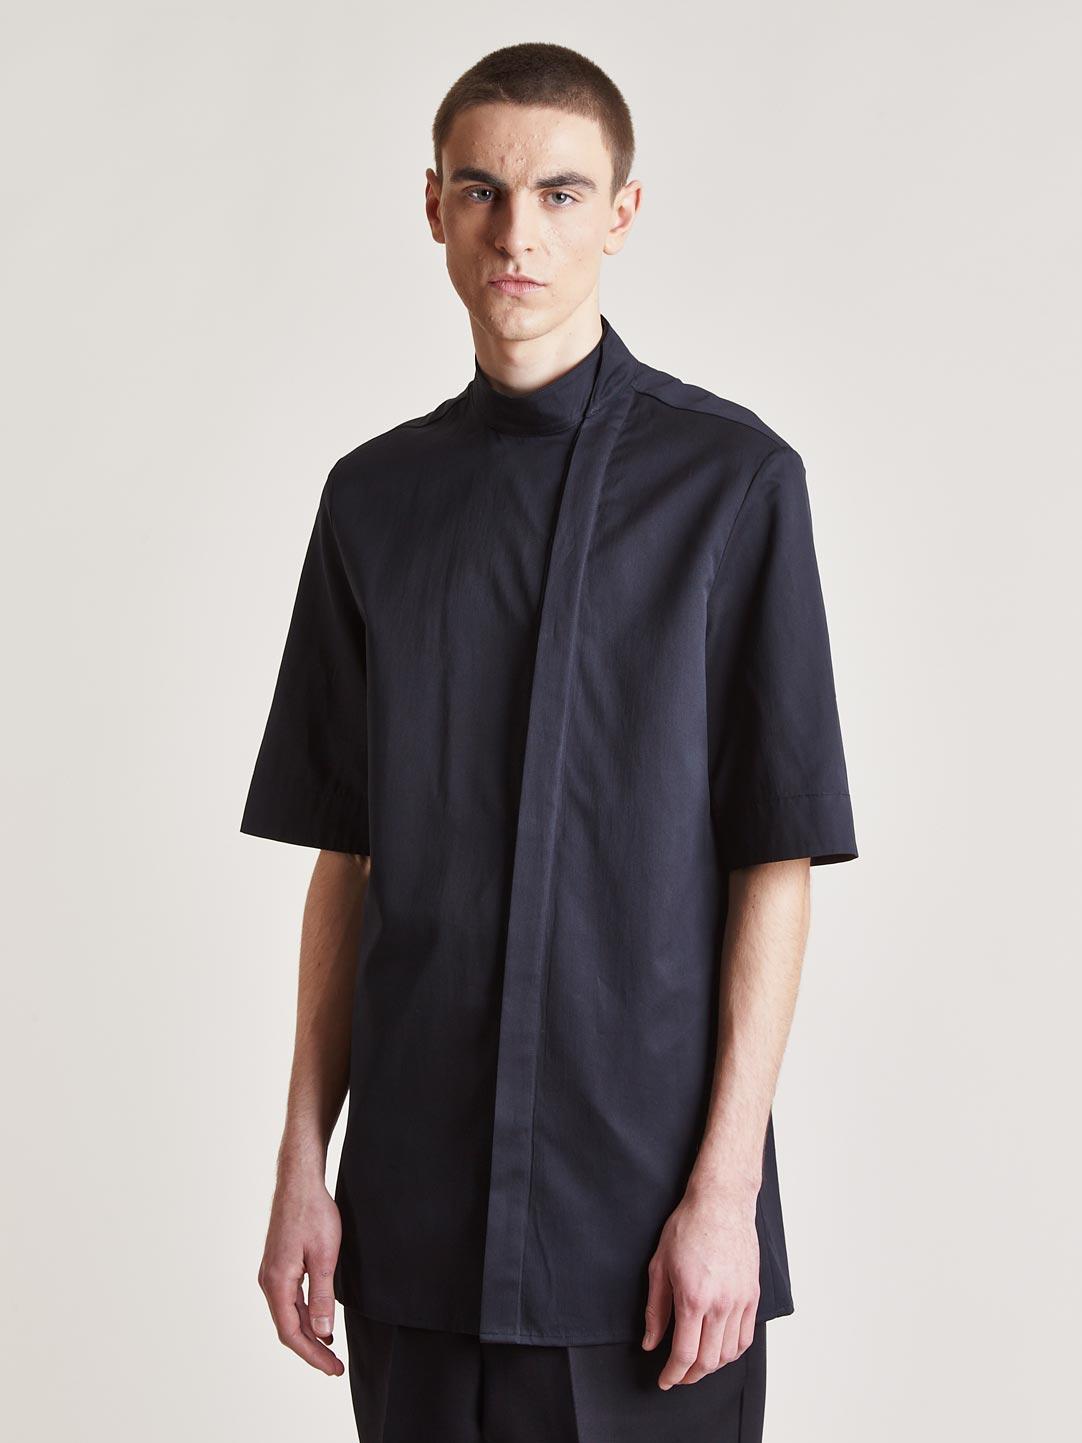 Kimono Dervish Collar Shirt Thamanyah 1